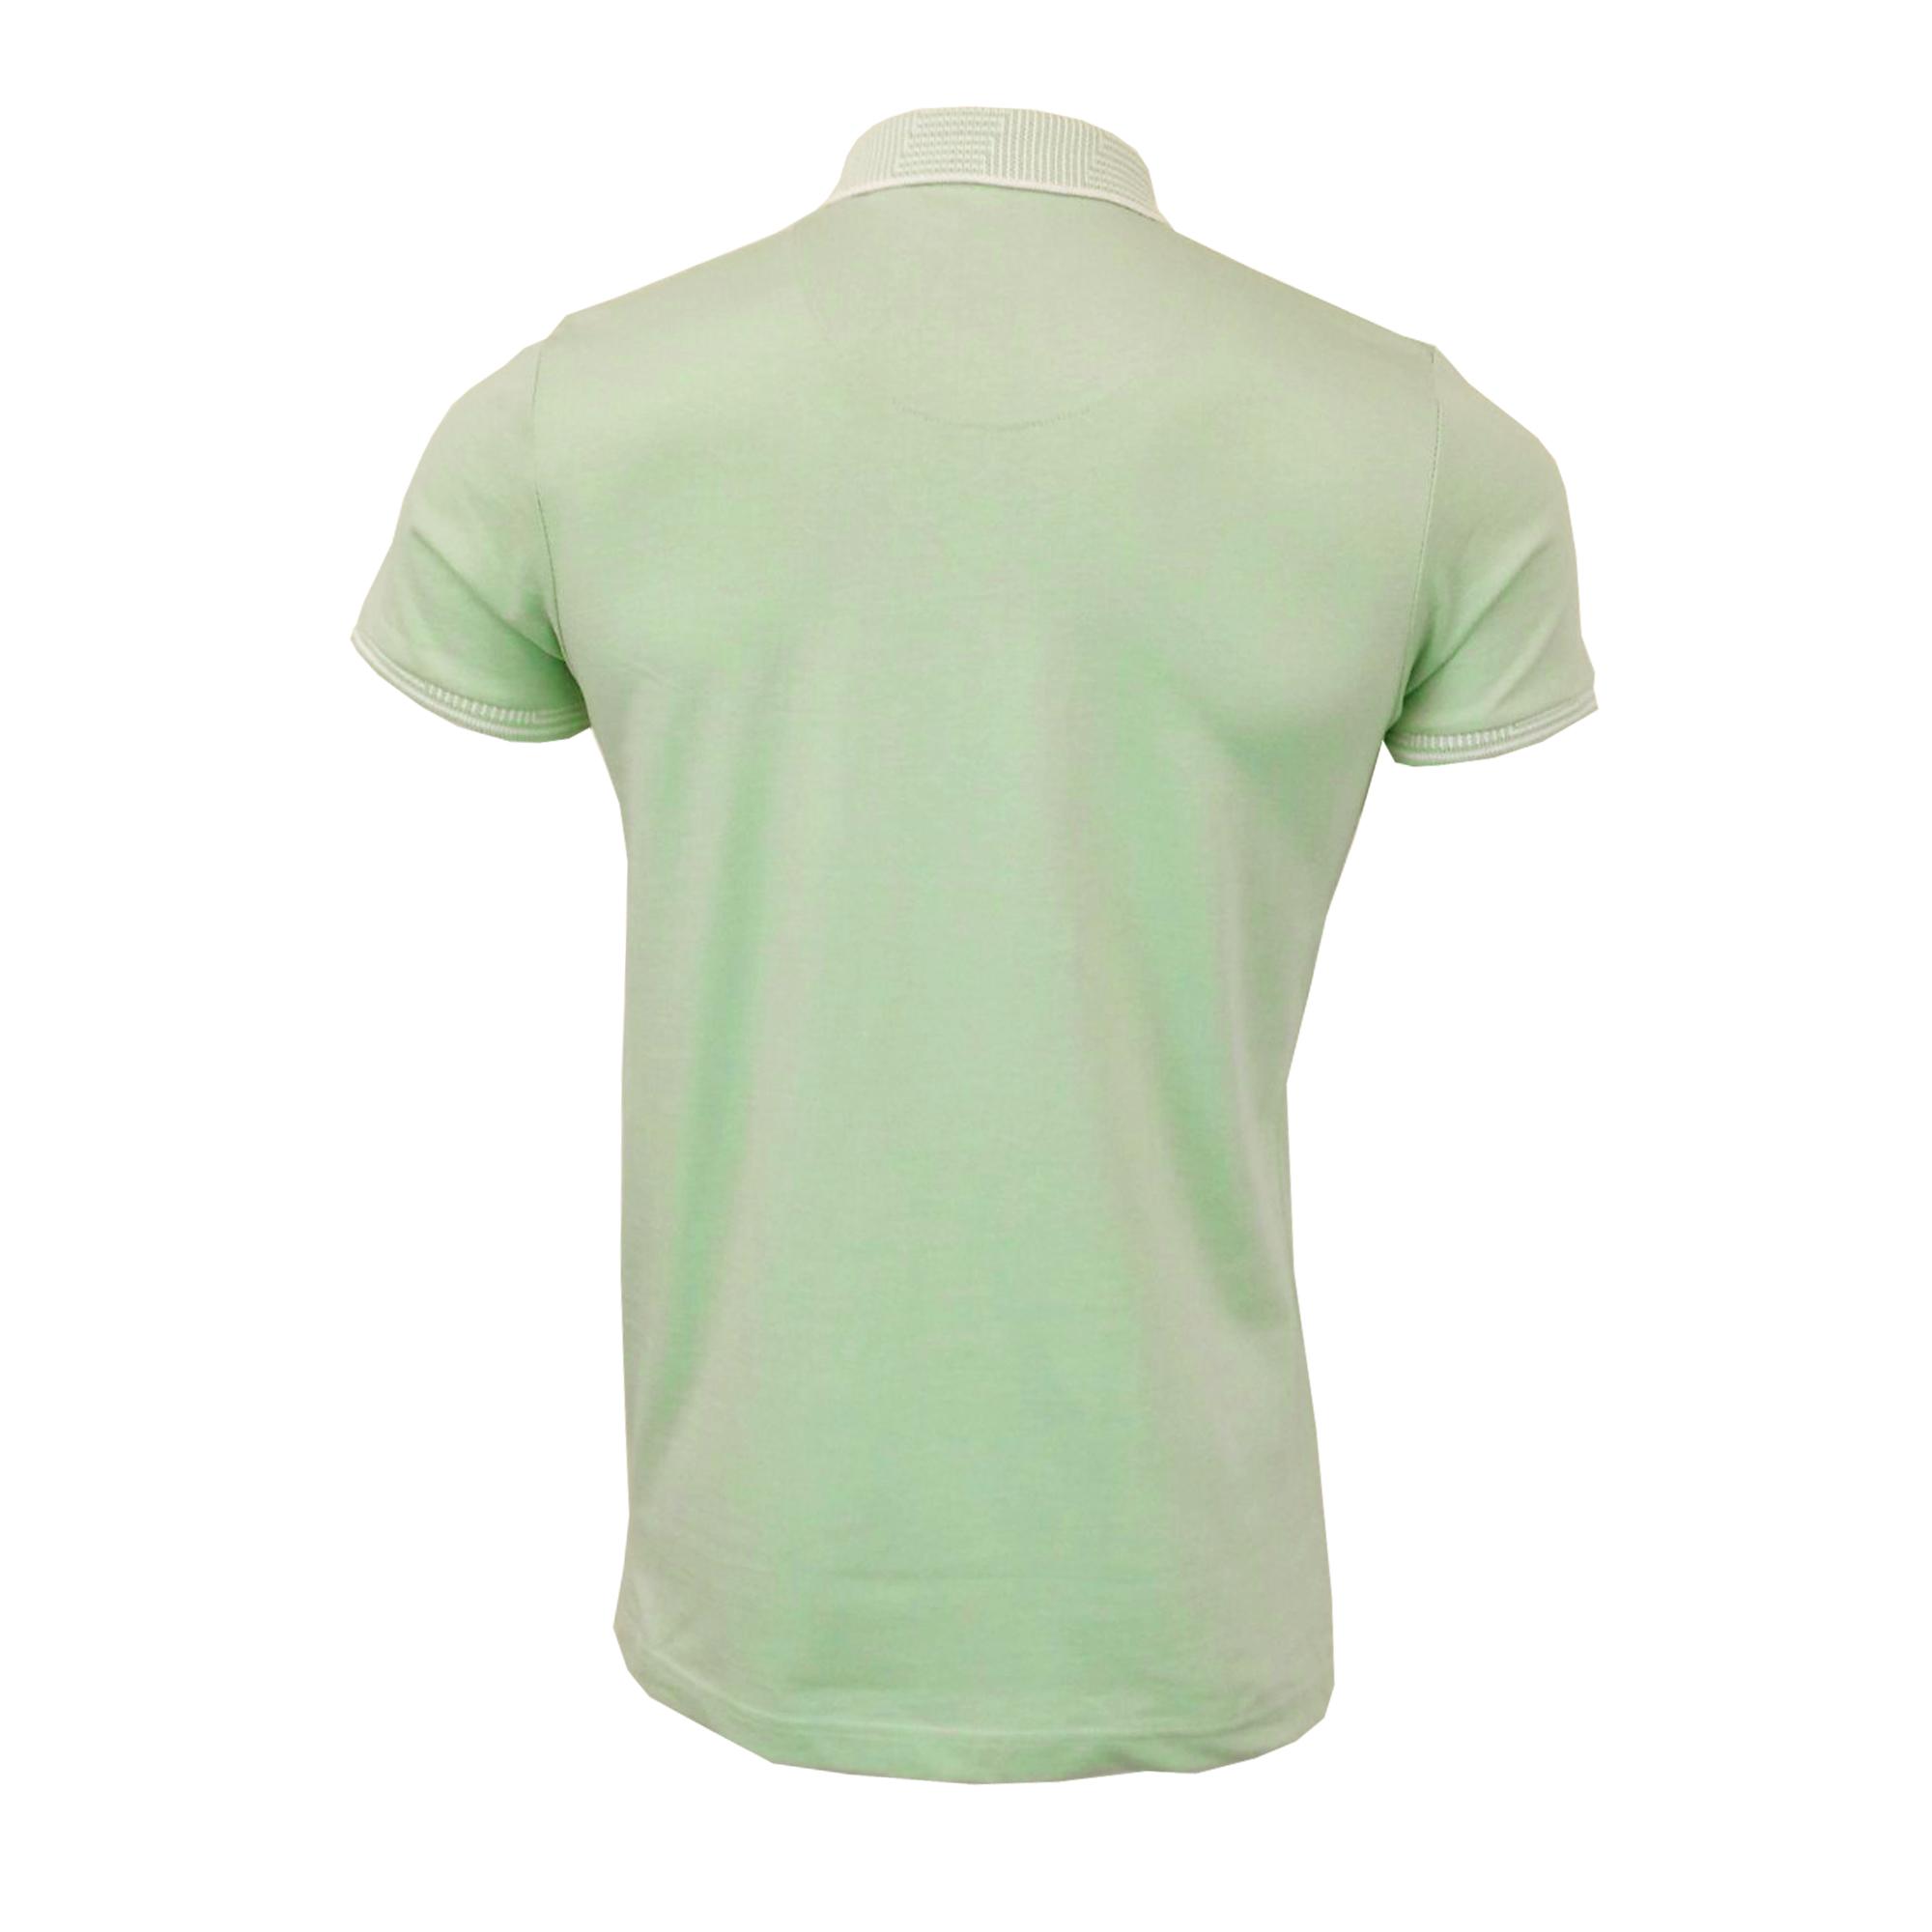 Mens-Polo-T-Shirt-Brave-Soul-Short-Sleeved-Cotton-GLOVER-Collared-KHALIFA-Summer thumbnail 9